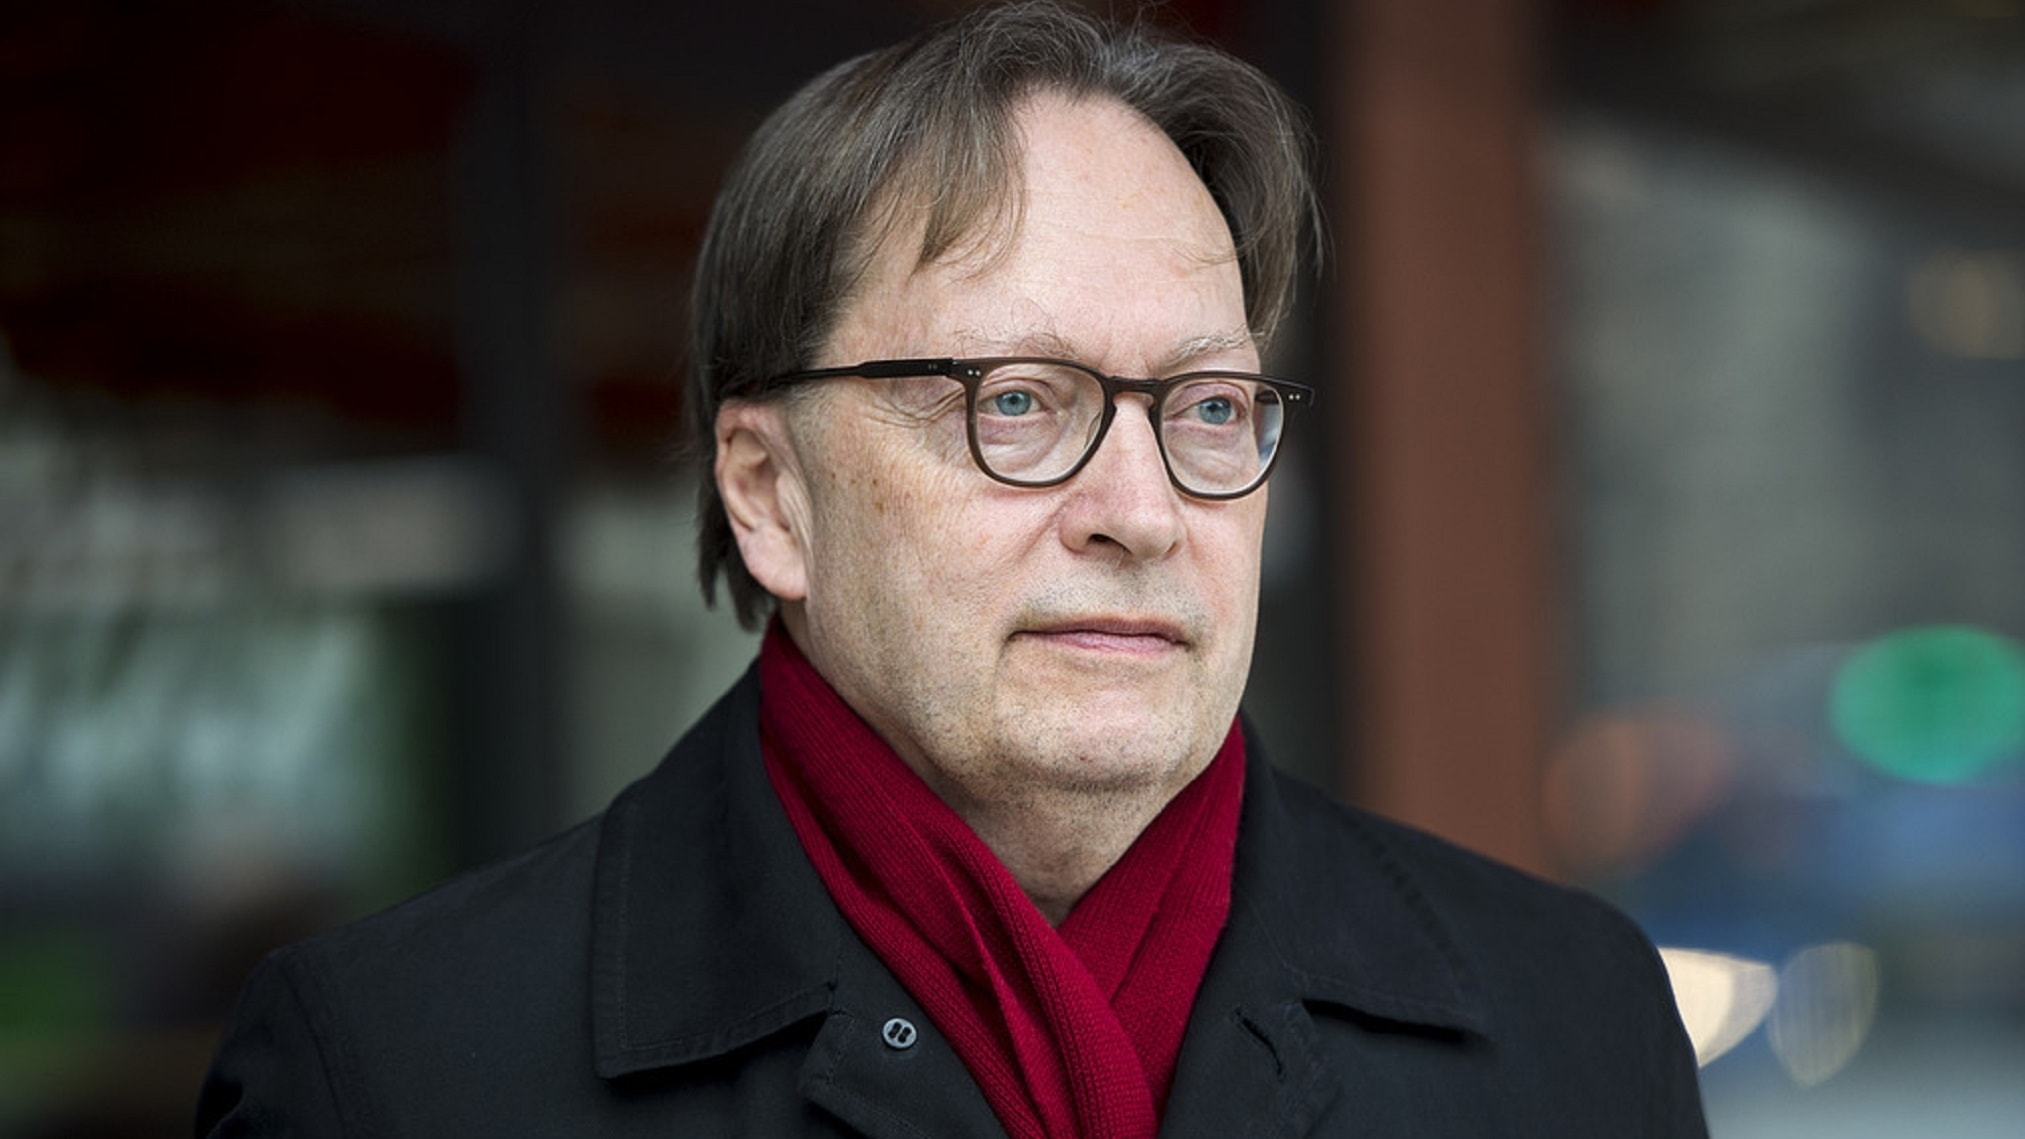 Svenska Akademien sammanträder. Kommer besked om Nobelpriset 2018?